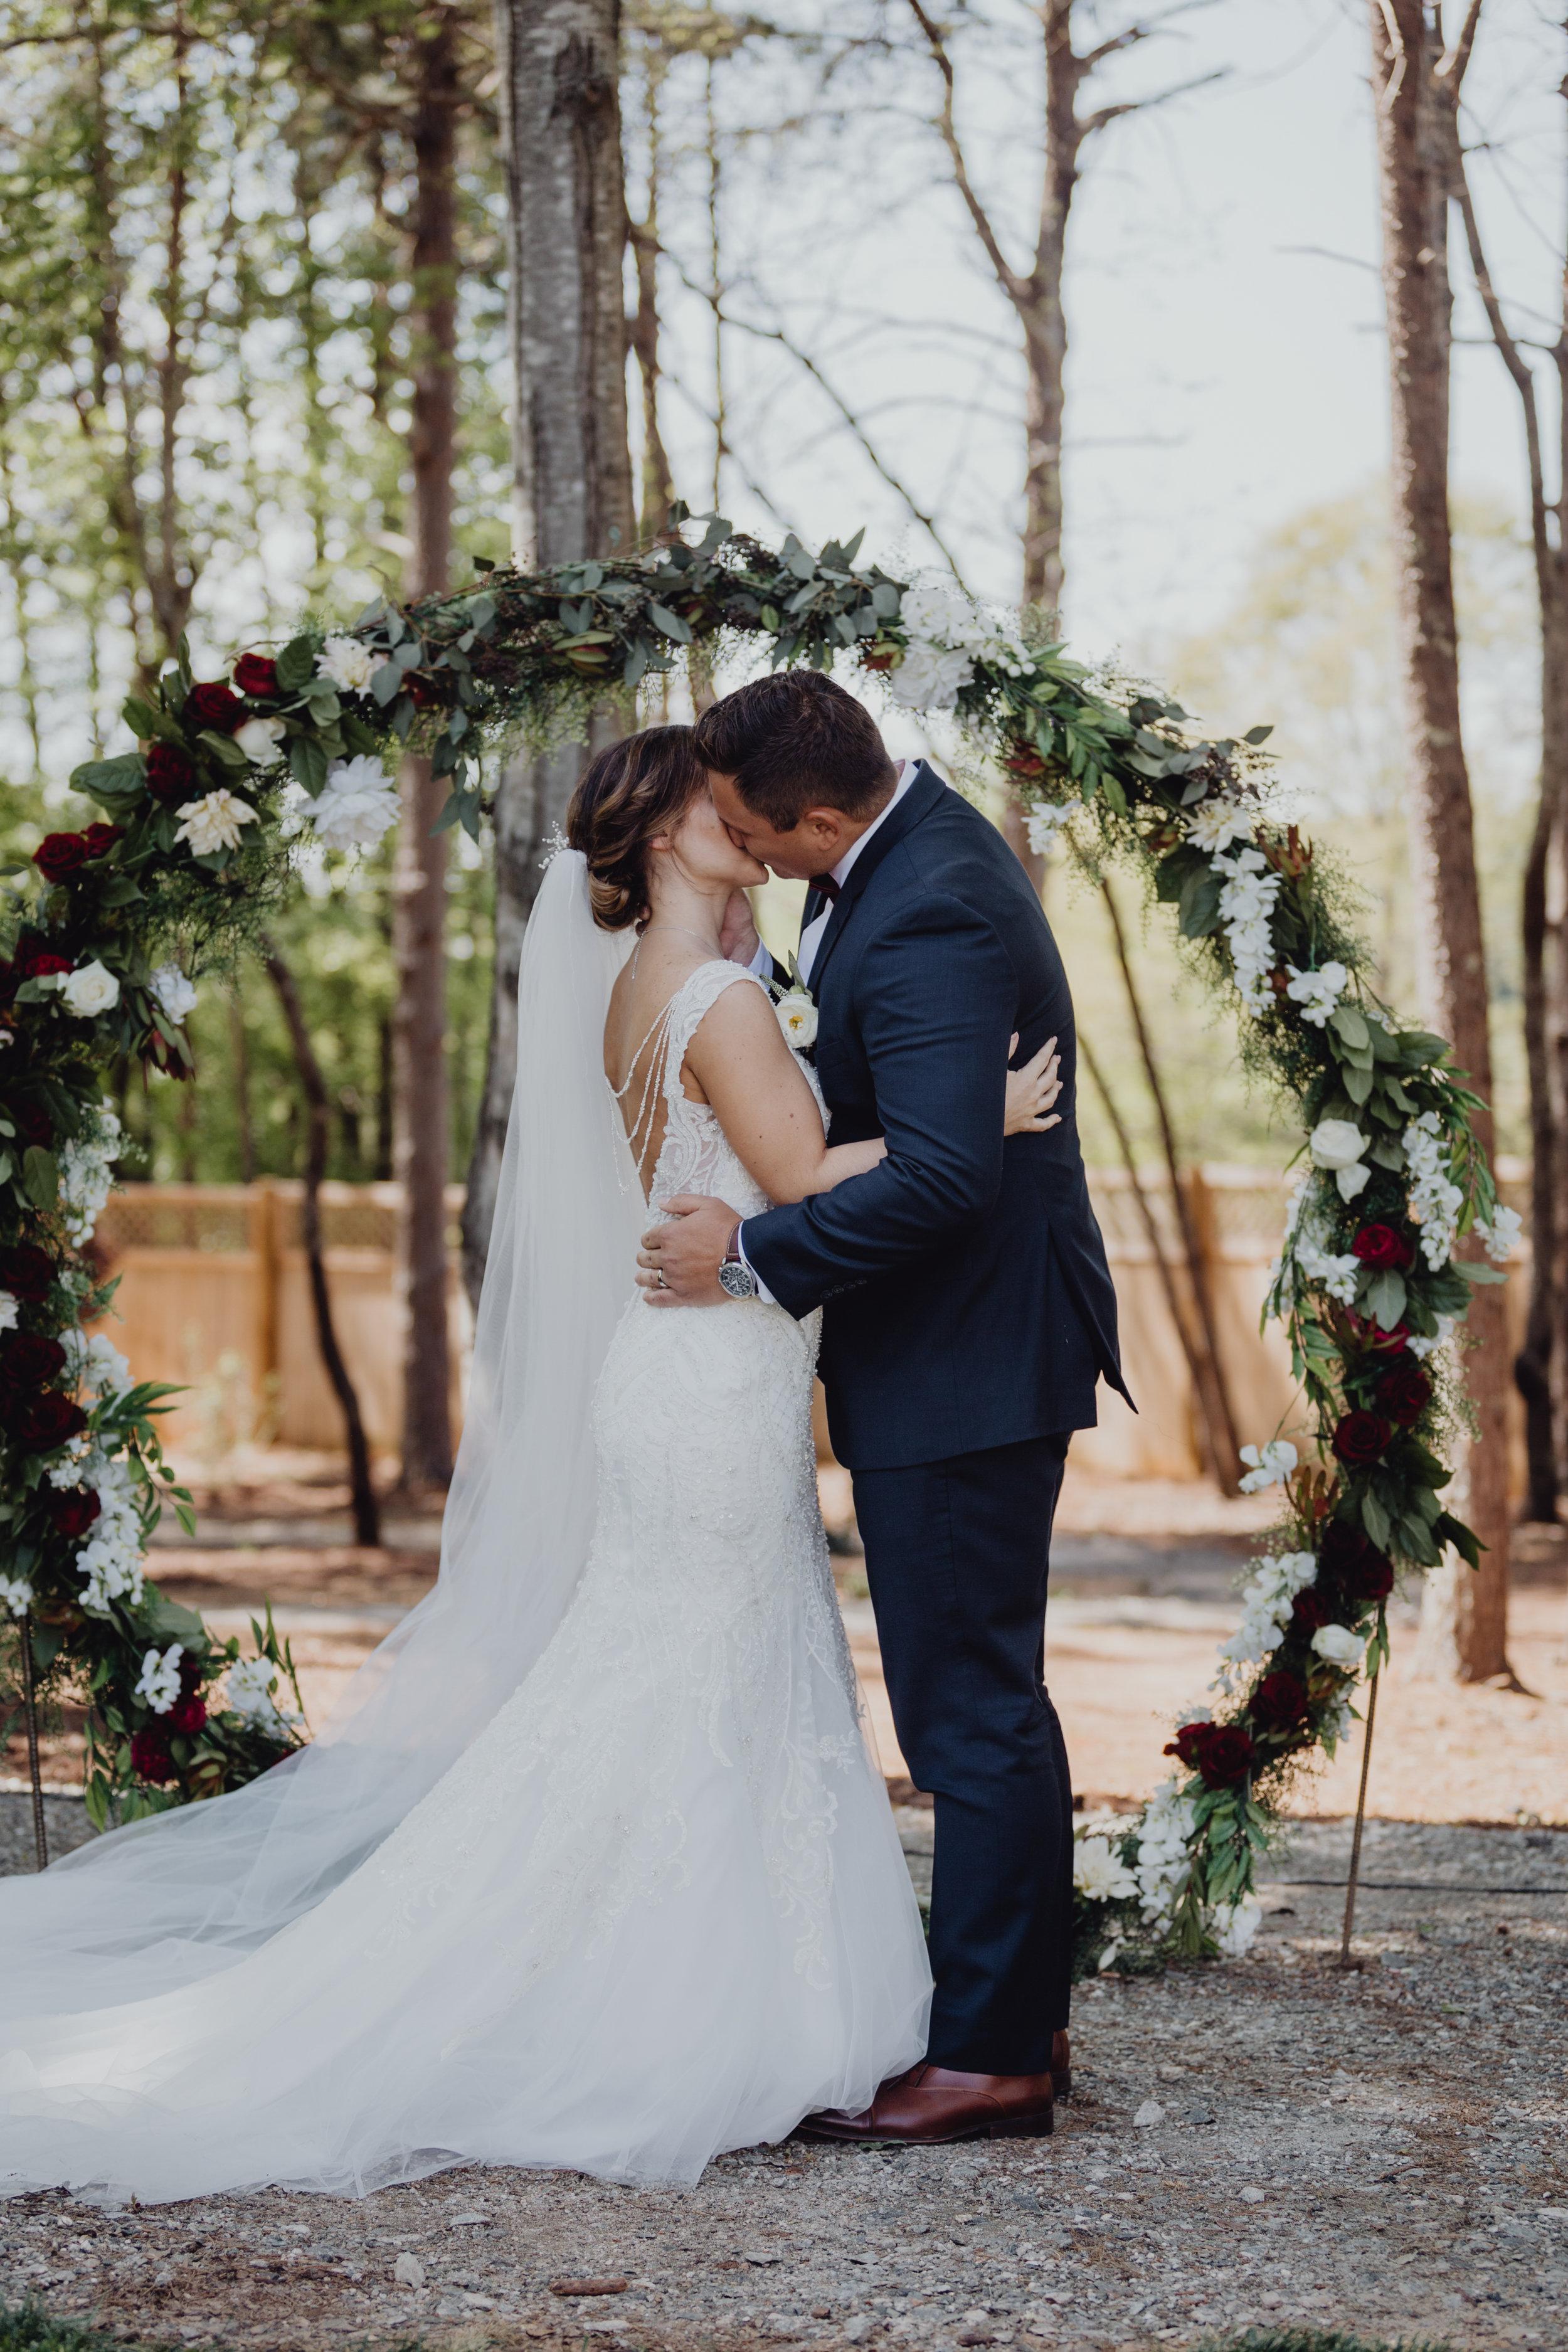 Marieanna+Dmitriy_Wedding2018-163.jpg